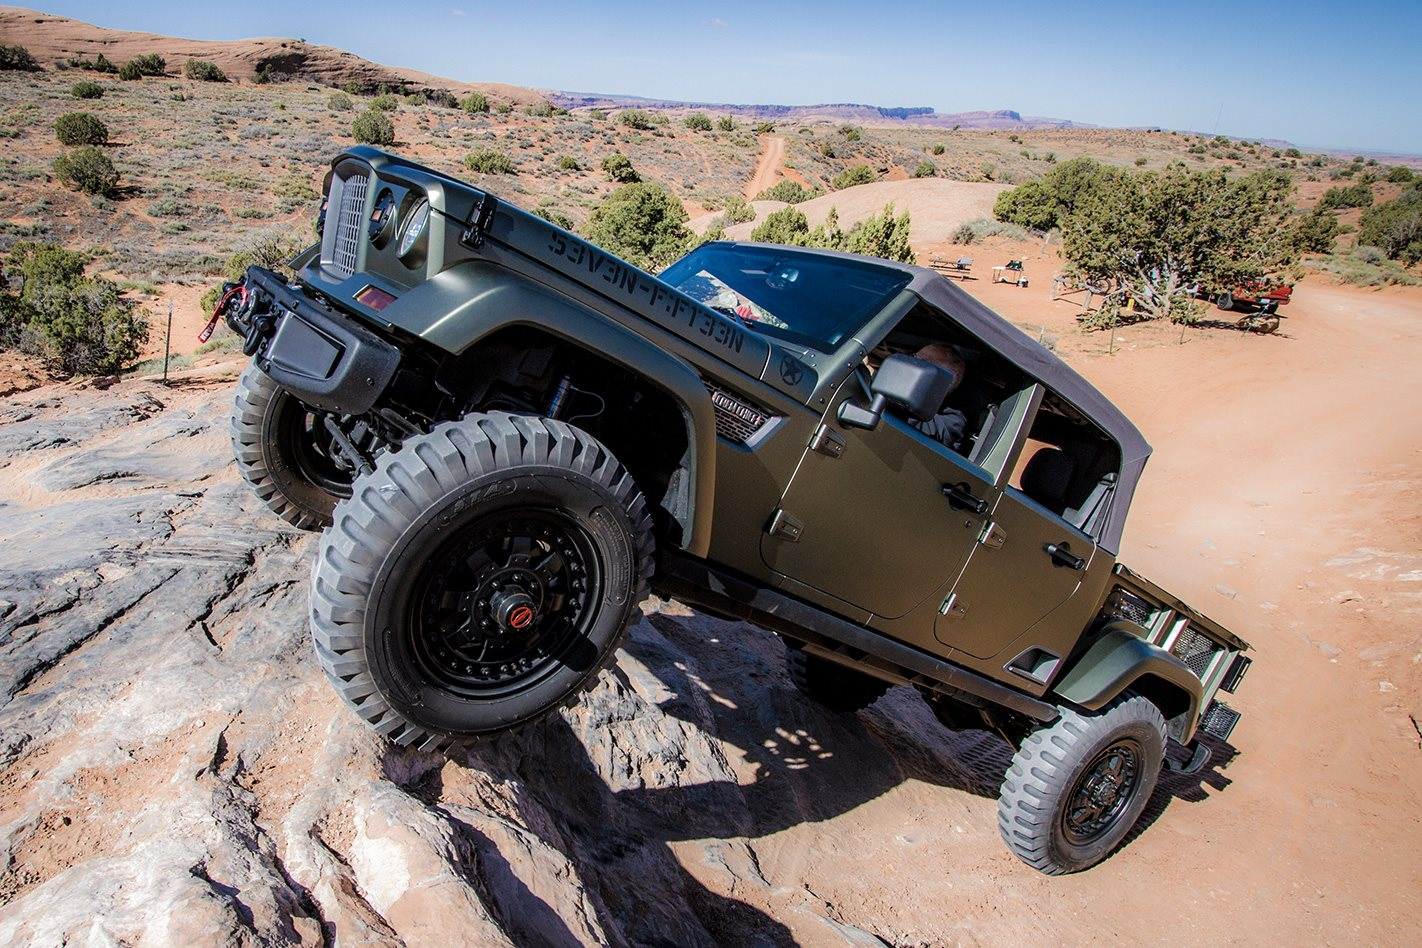 jeep crew chief 715 concept review 4x4 australia. Black Bedroom Furniture Sets. Home Design Ideas